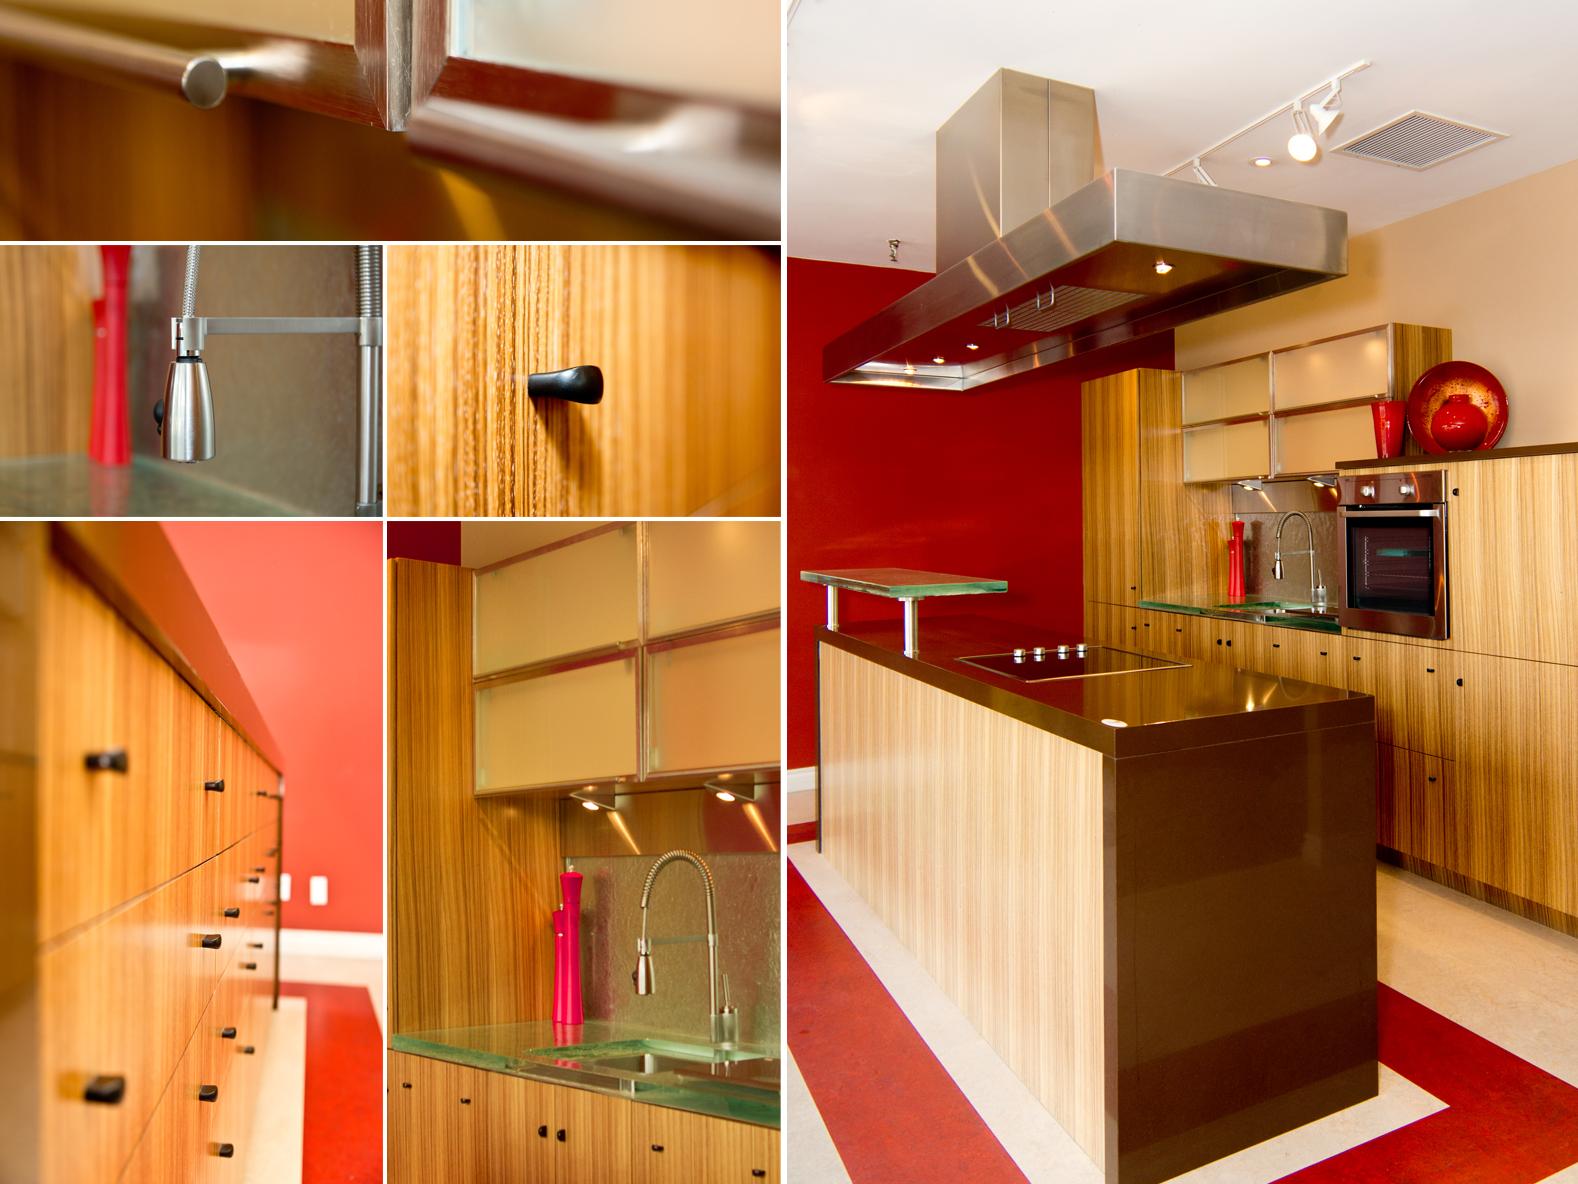 monarch kitchen island newport brass faucet & bath centre: two designer ...